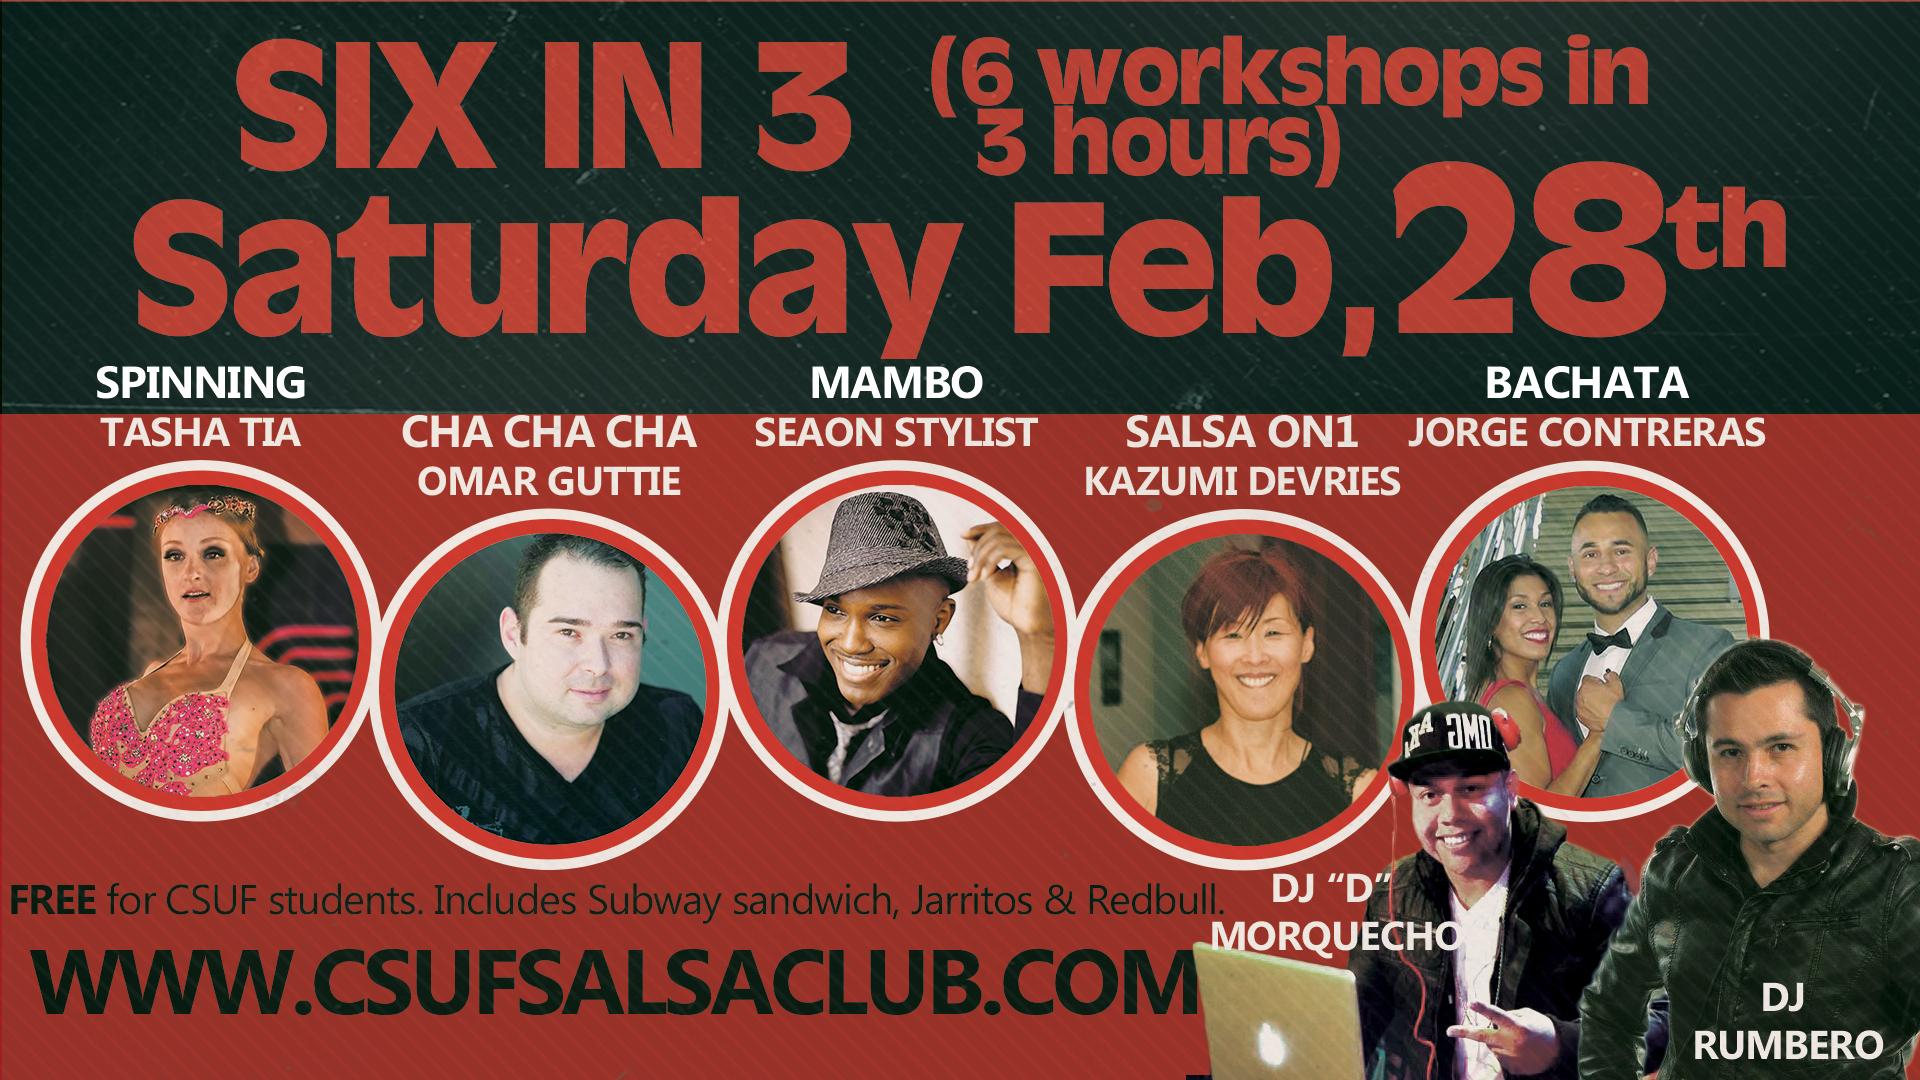 Tasha Tia, Omar Guttie, Seaon Stylist-Bristol, Kazumi DeVries, and Jorge Contreras